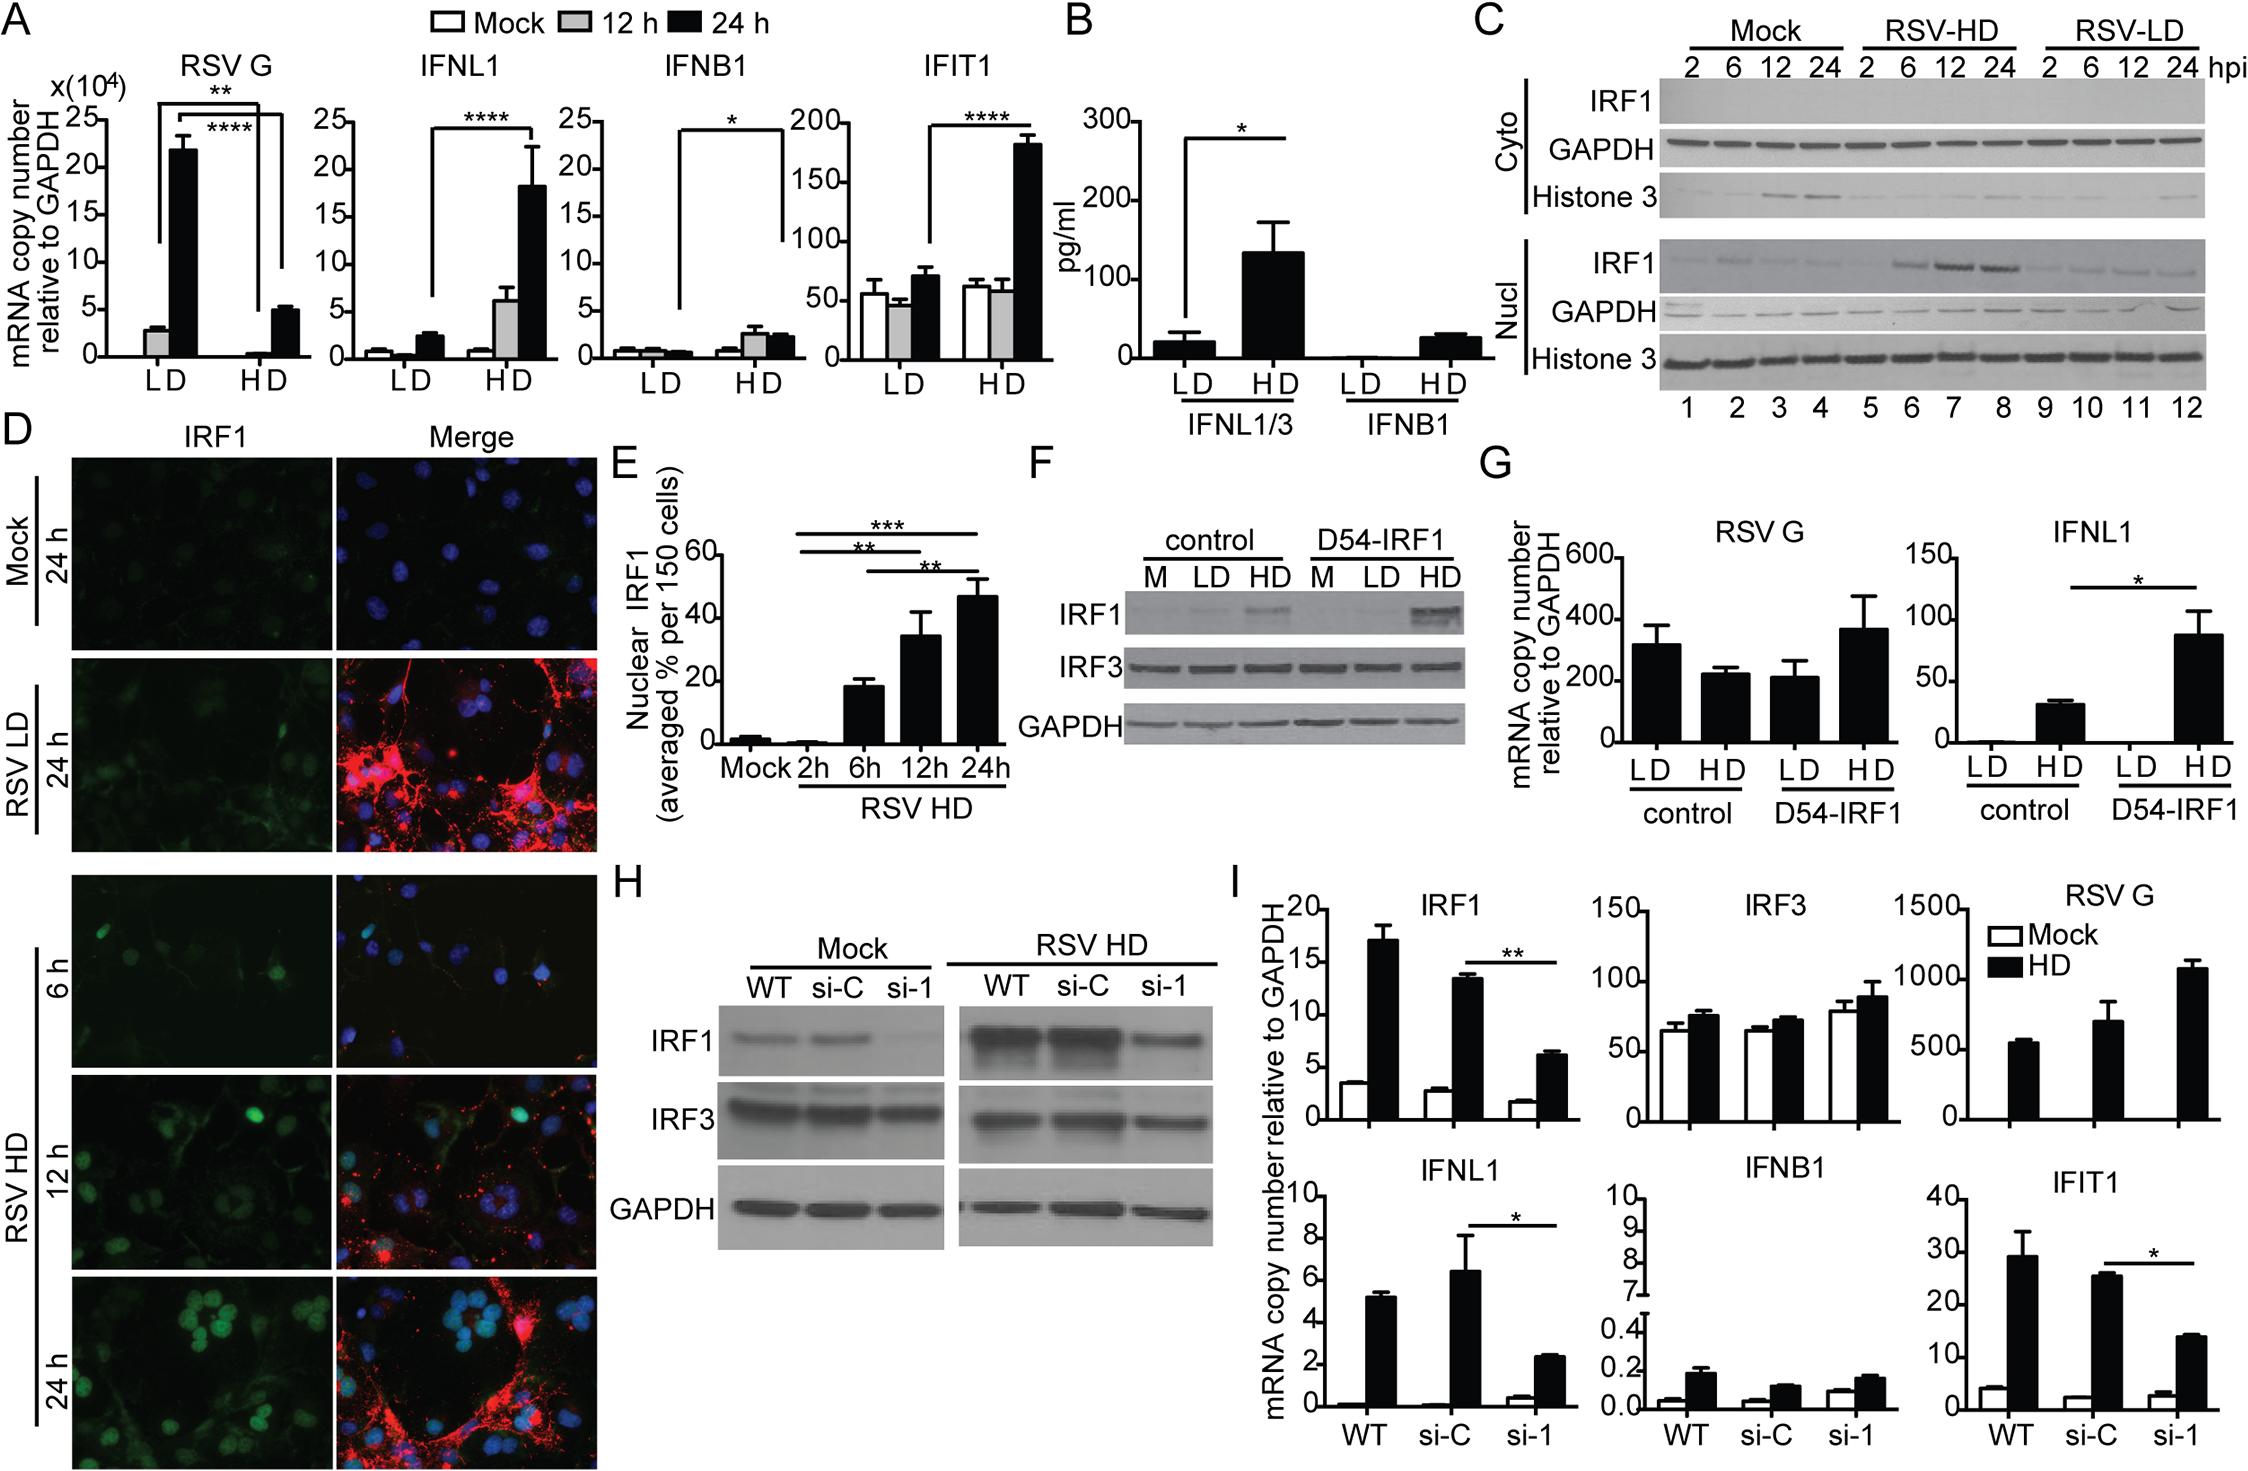 RSV iDVGs stimulate an IRF1/IFNL1-mediated antiviral response.